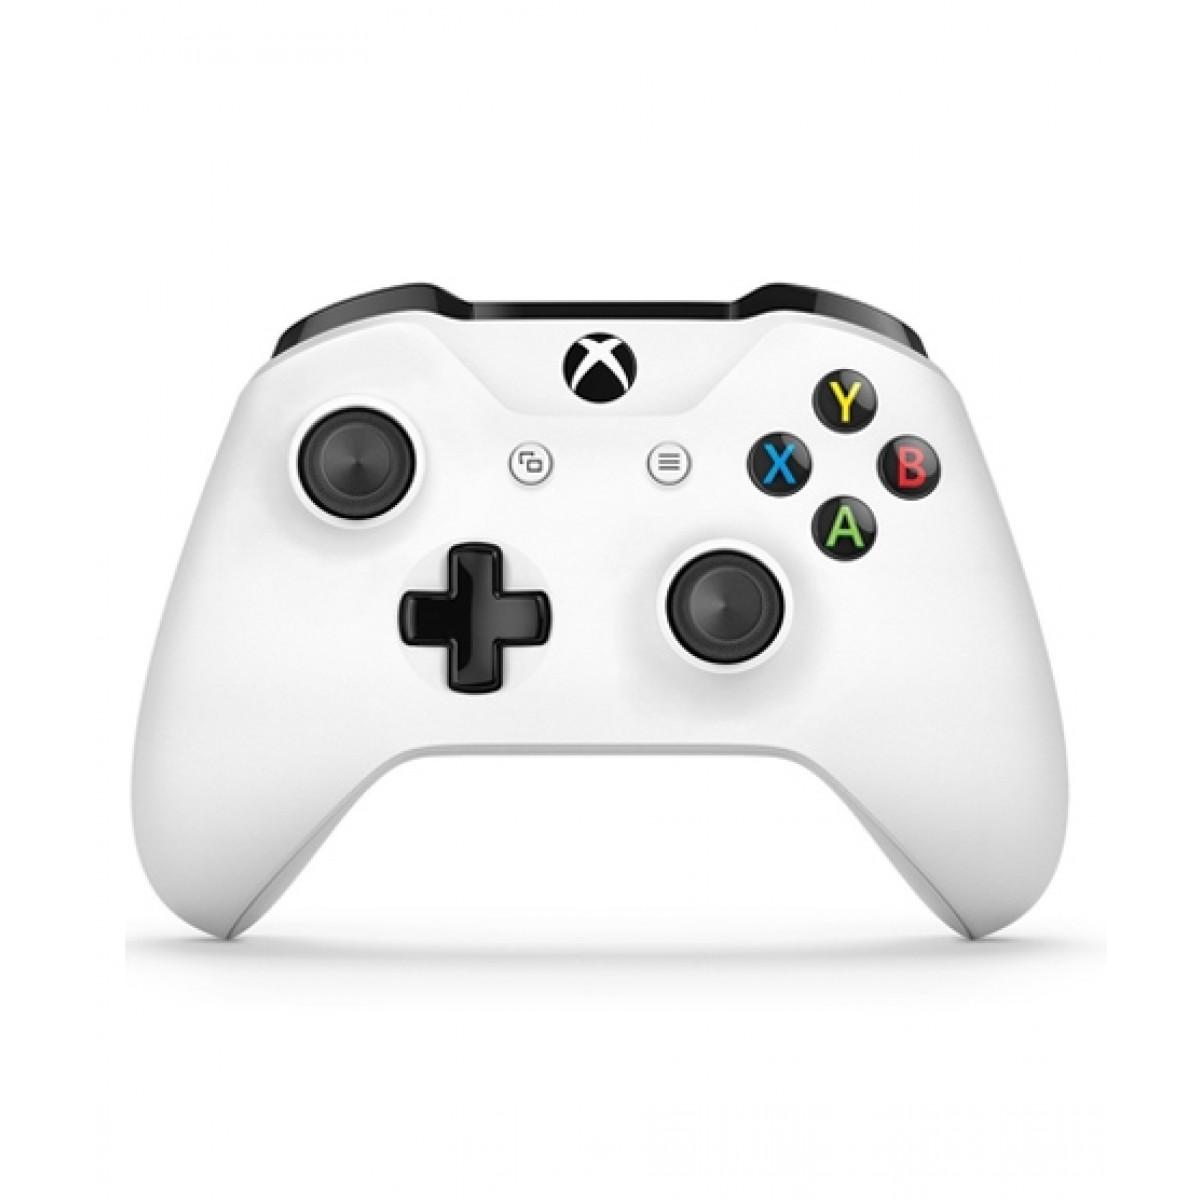 Microsoft Xbox One S Wireless Controller - White Price in Pakistan | Buy Xbox  Wireless Controller | iShopping.pk